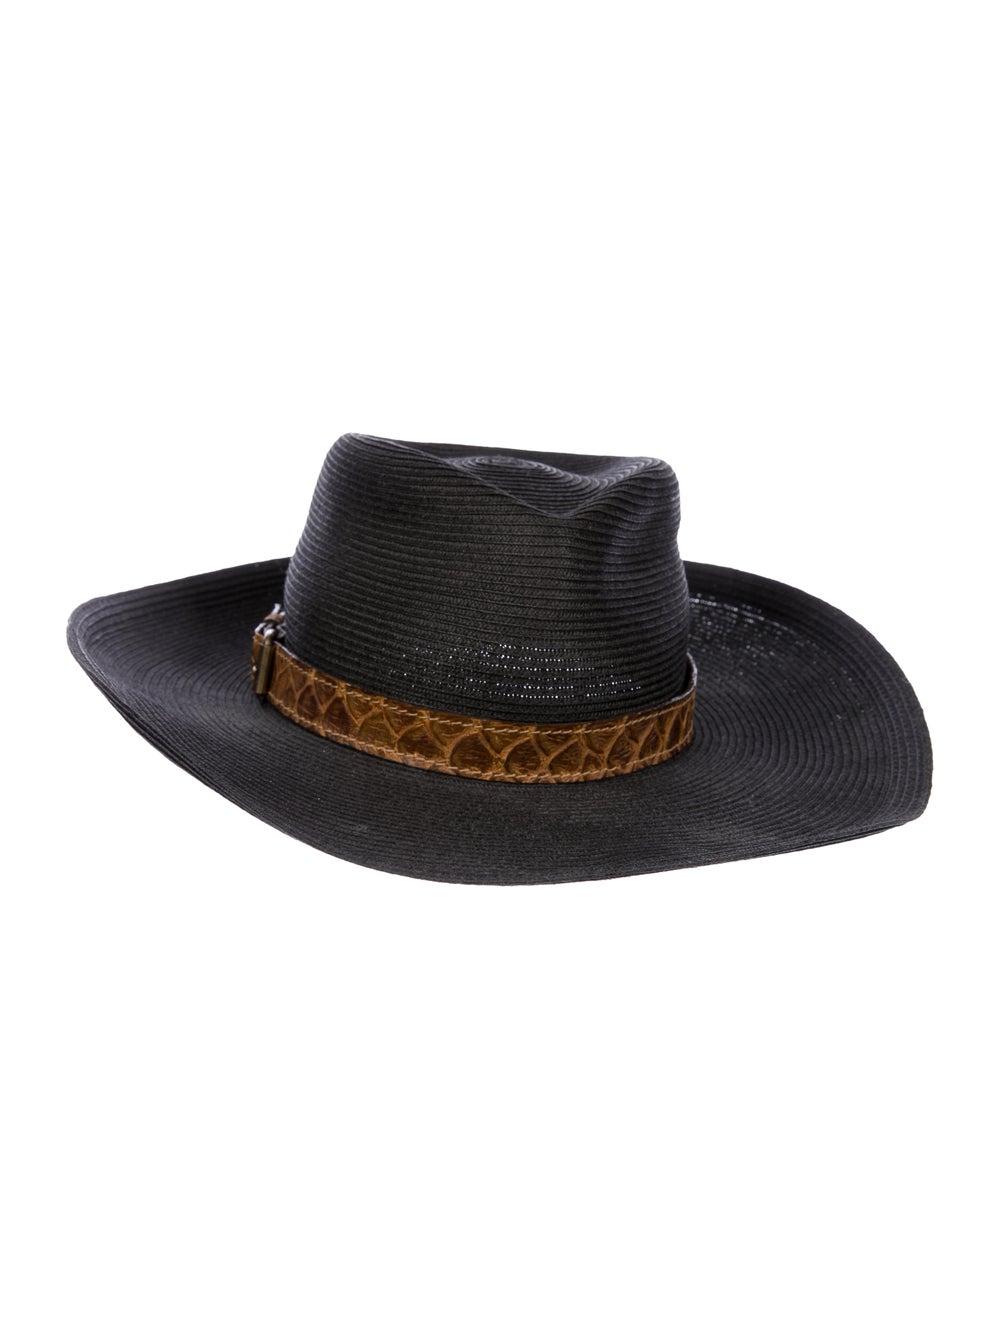 Eric Javits Straw Wide Brim Hat Black - image 2